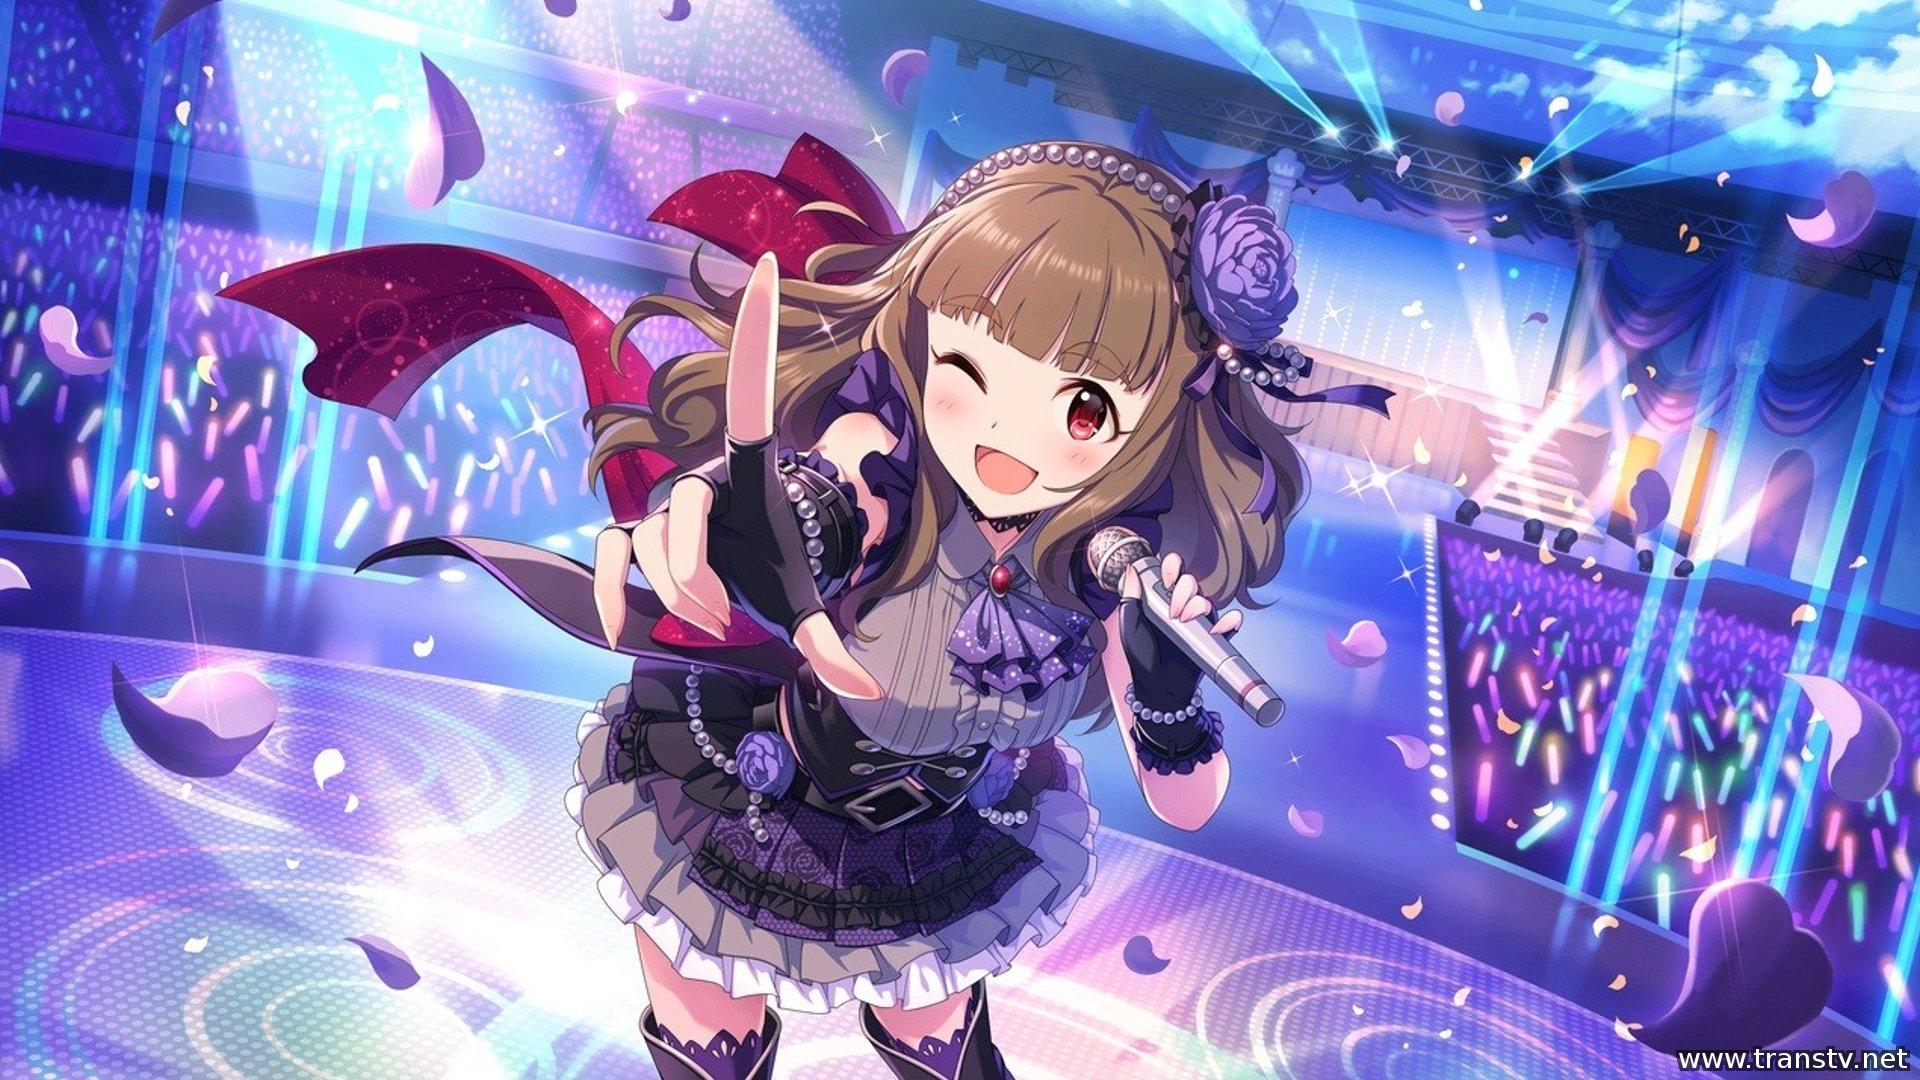 Cute Small Girl Wallpapers For Facebook Anime Girl Singer Cute Dress Wallpaper 1920x1080